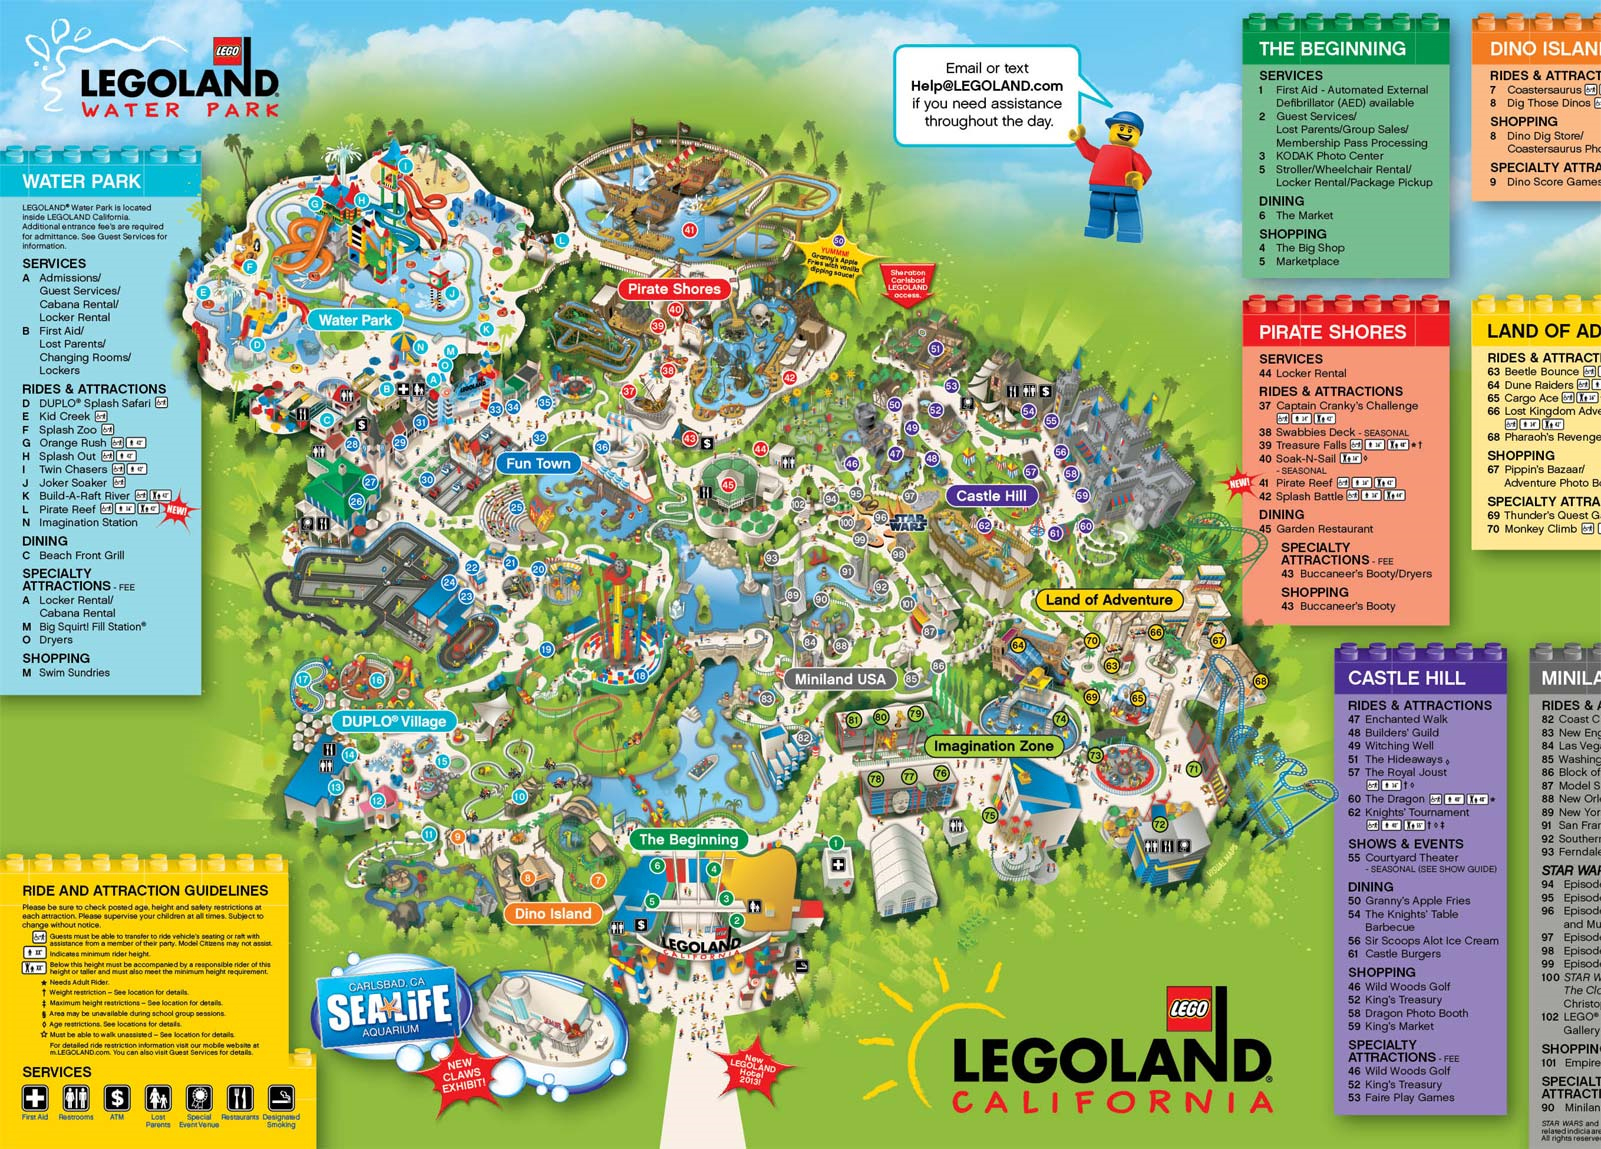 A Map Of Legoland California | Legoland California Resort; Carlsbad - Legoland California Water Park Map